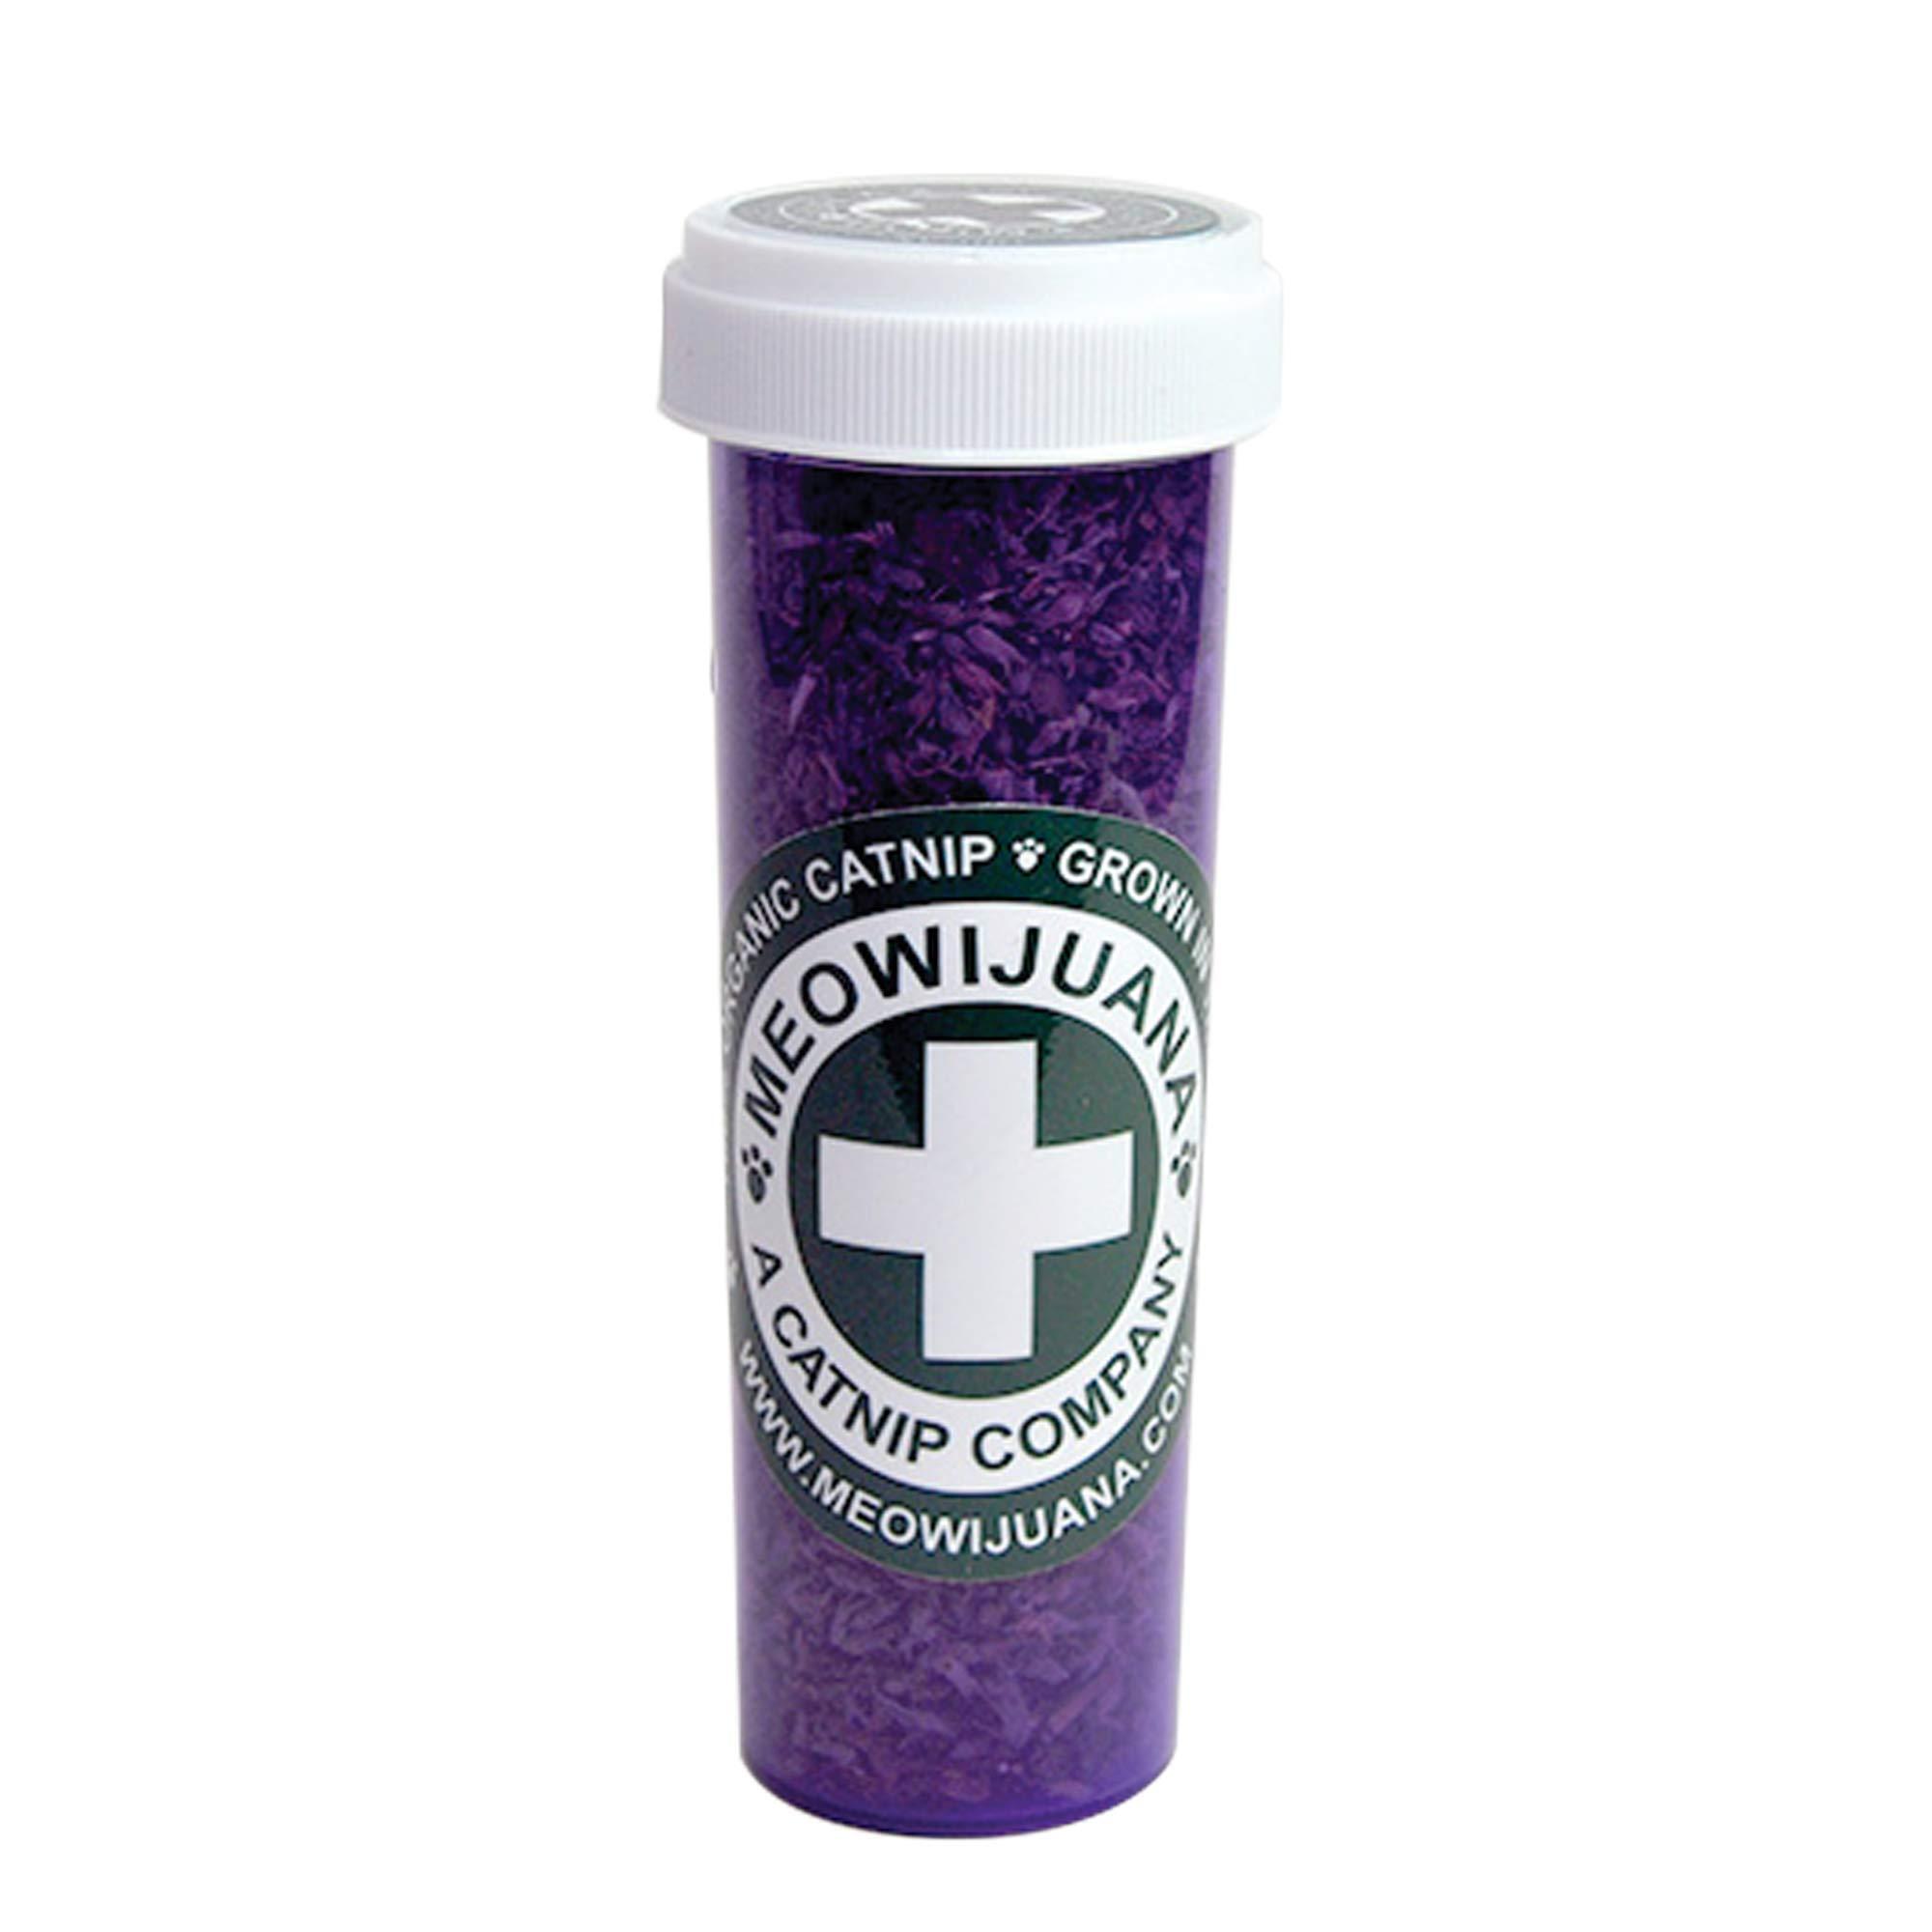 Meowijuana Purrple Passion - Silvervine and Catnip Blend - Large Bottle